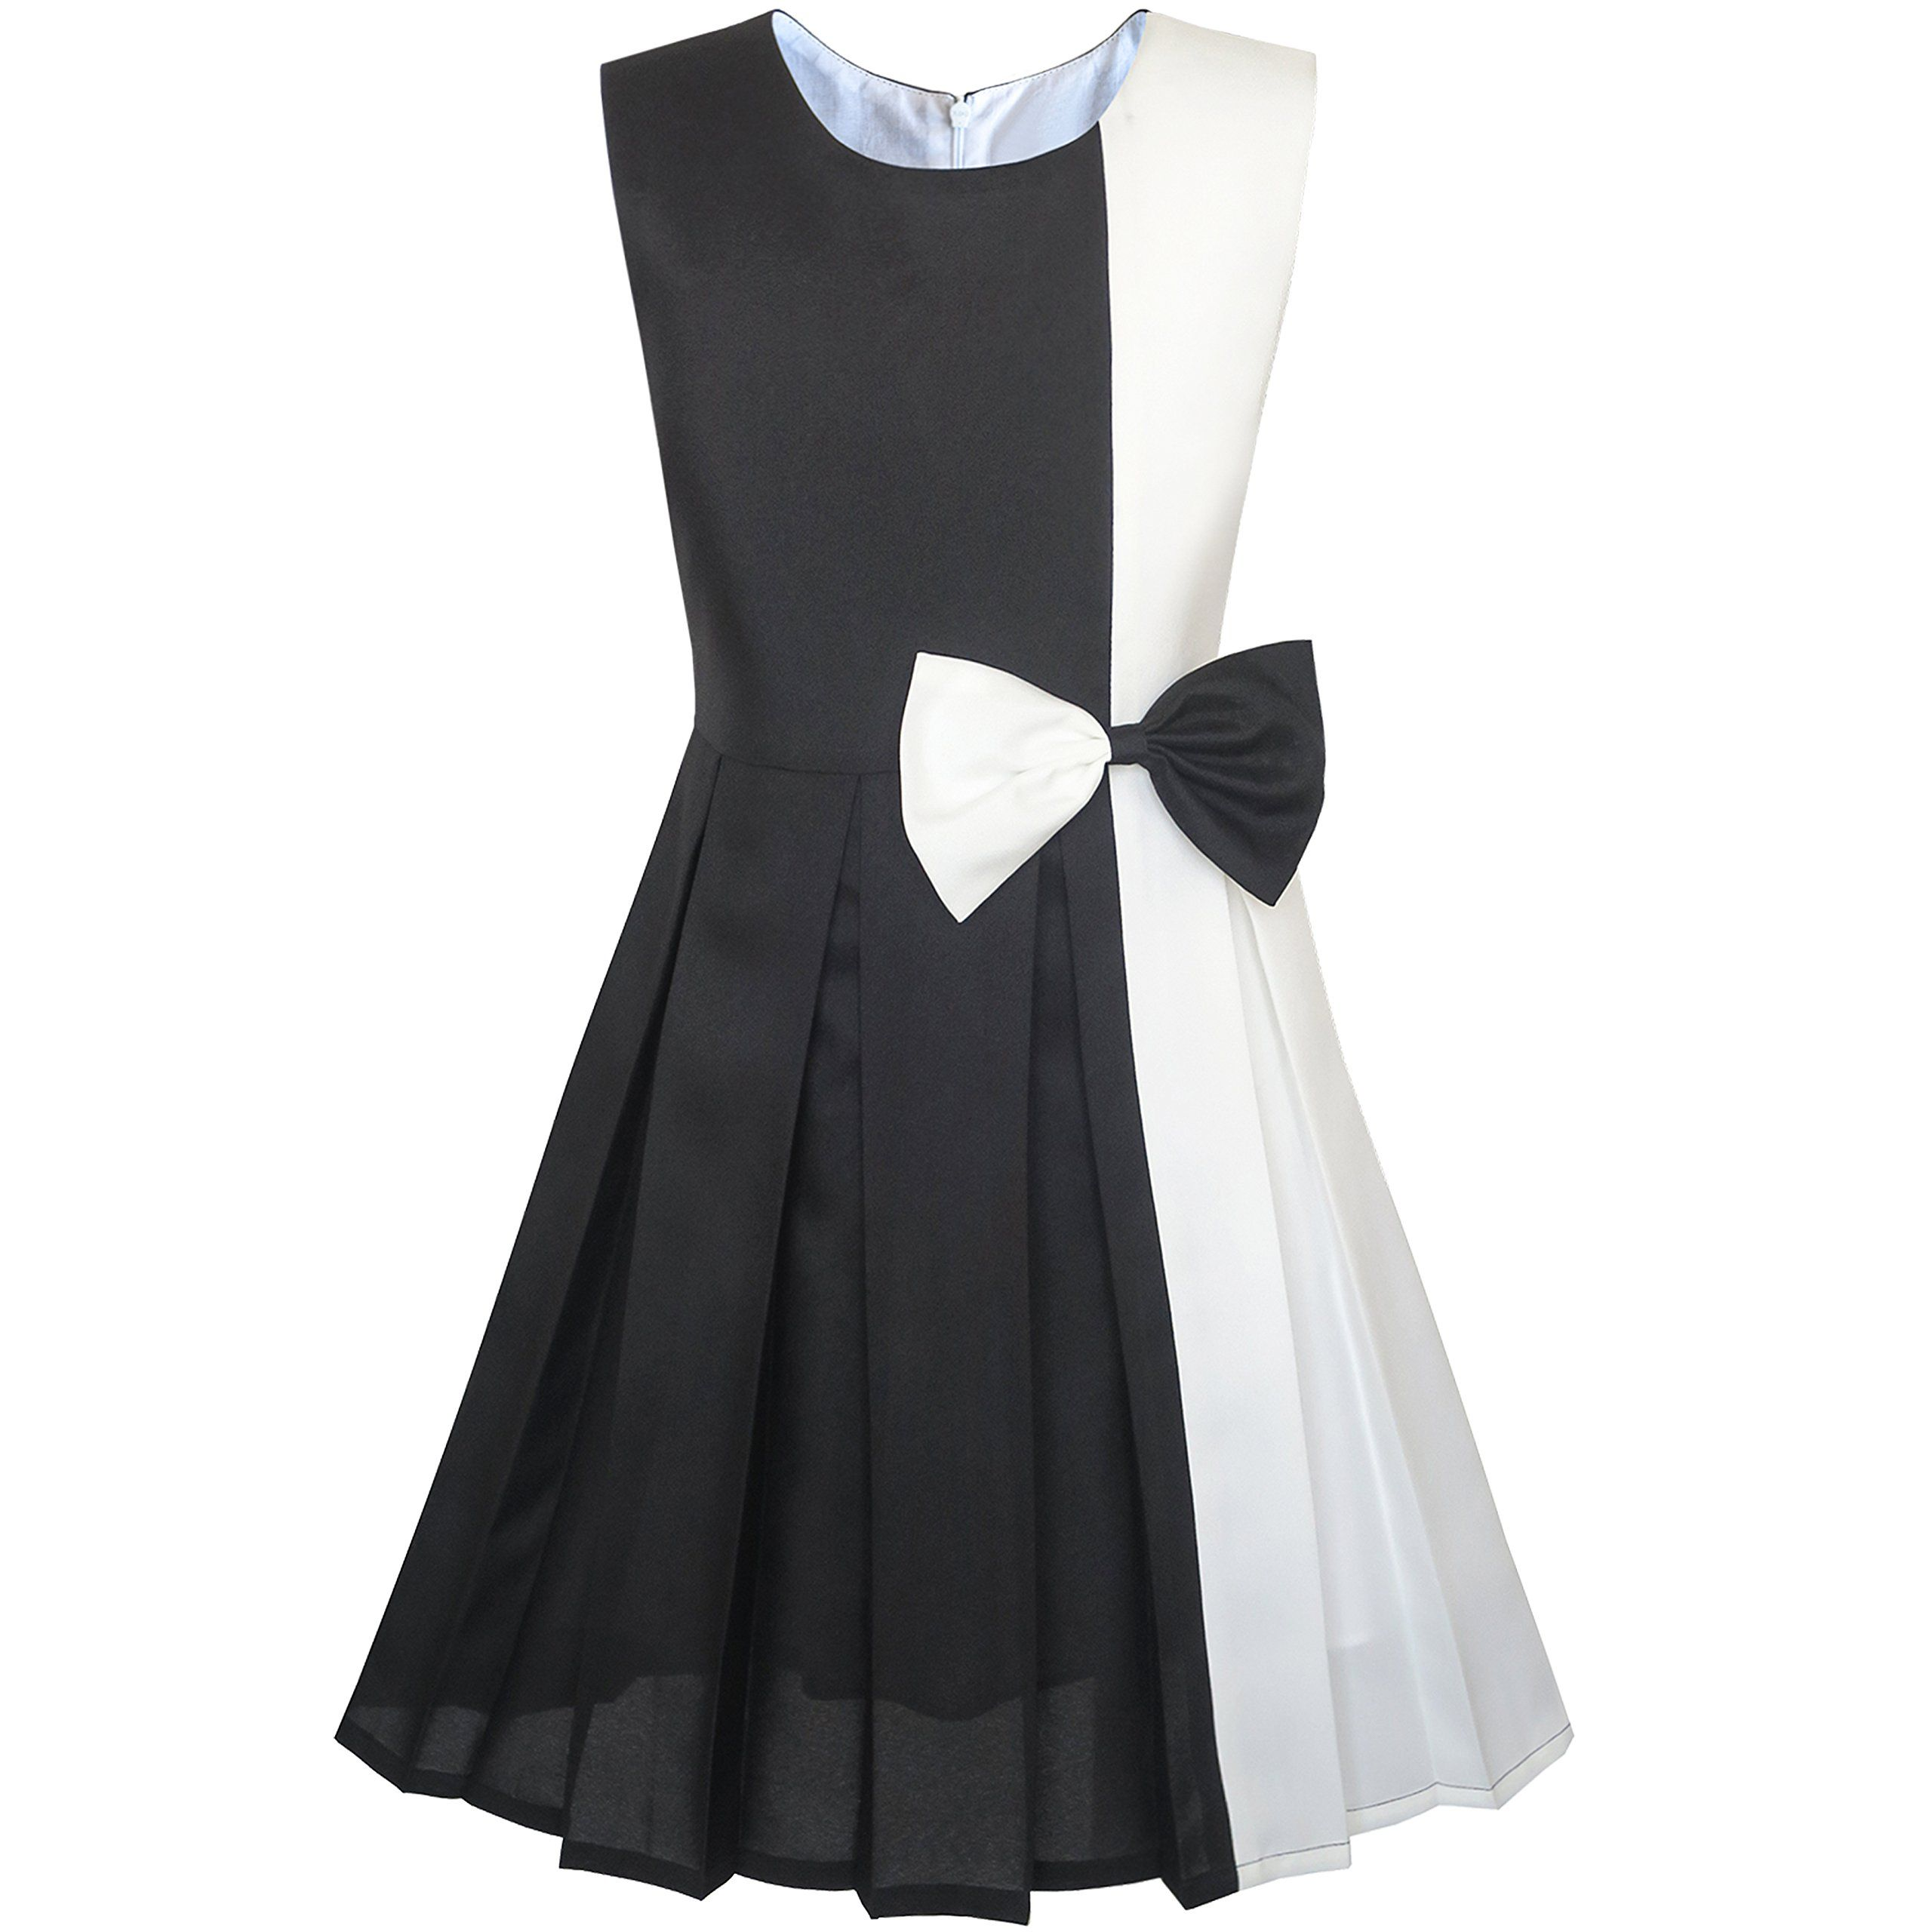 0b304063db7e KM87 Girls Dress Color Block Contrast White Black Bow Tie Size 12 ...